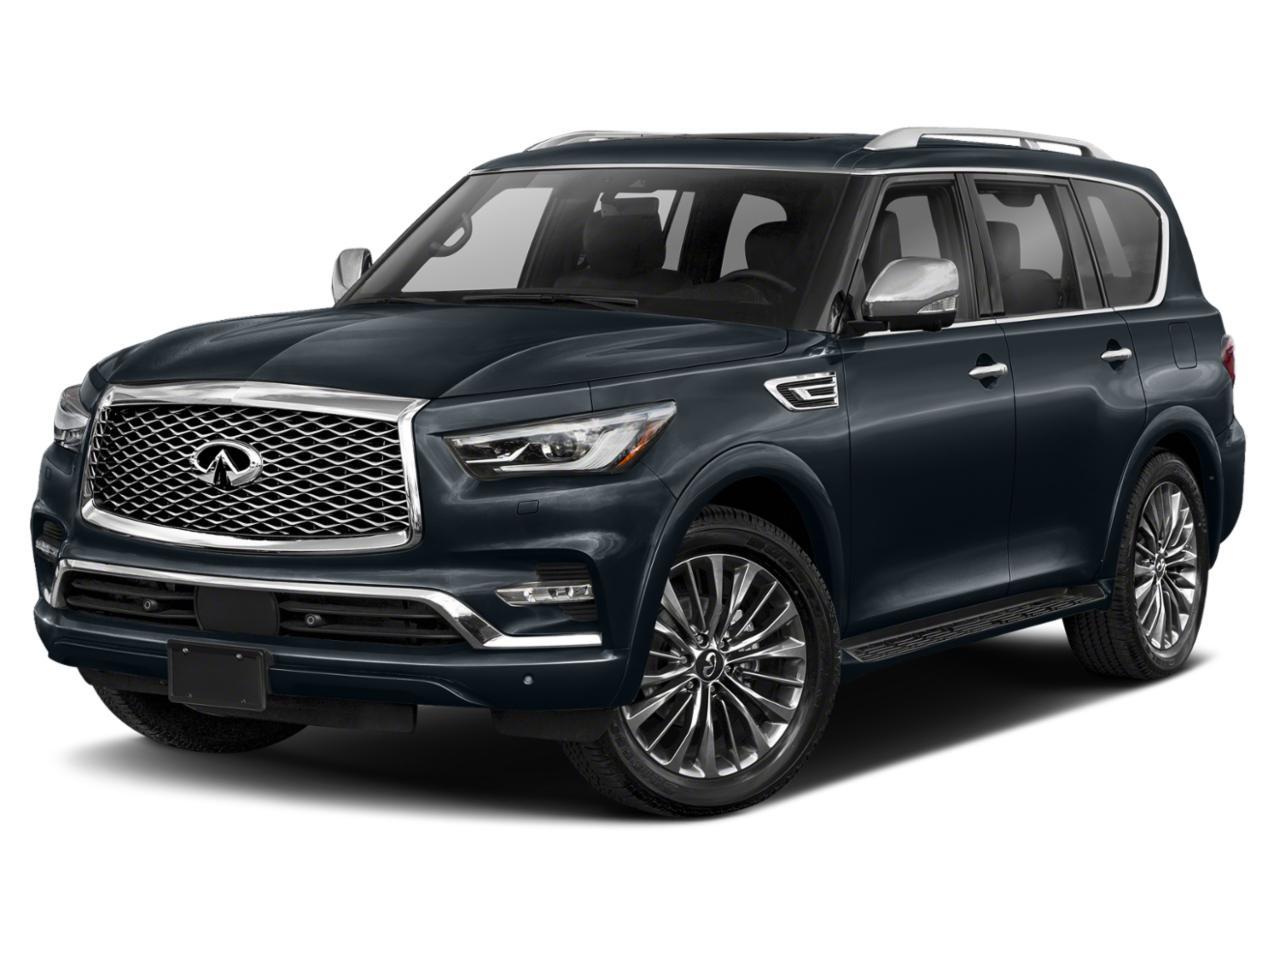 2022 INFINITI QX80 Vehicle Photo in HOUSTON, TX 77090